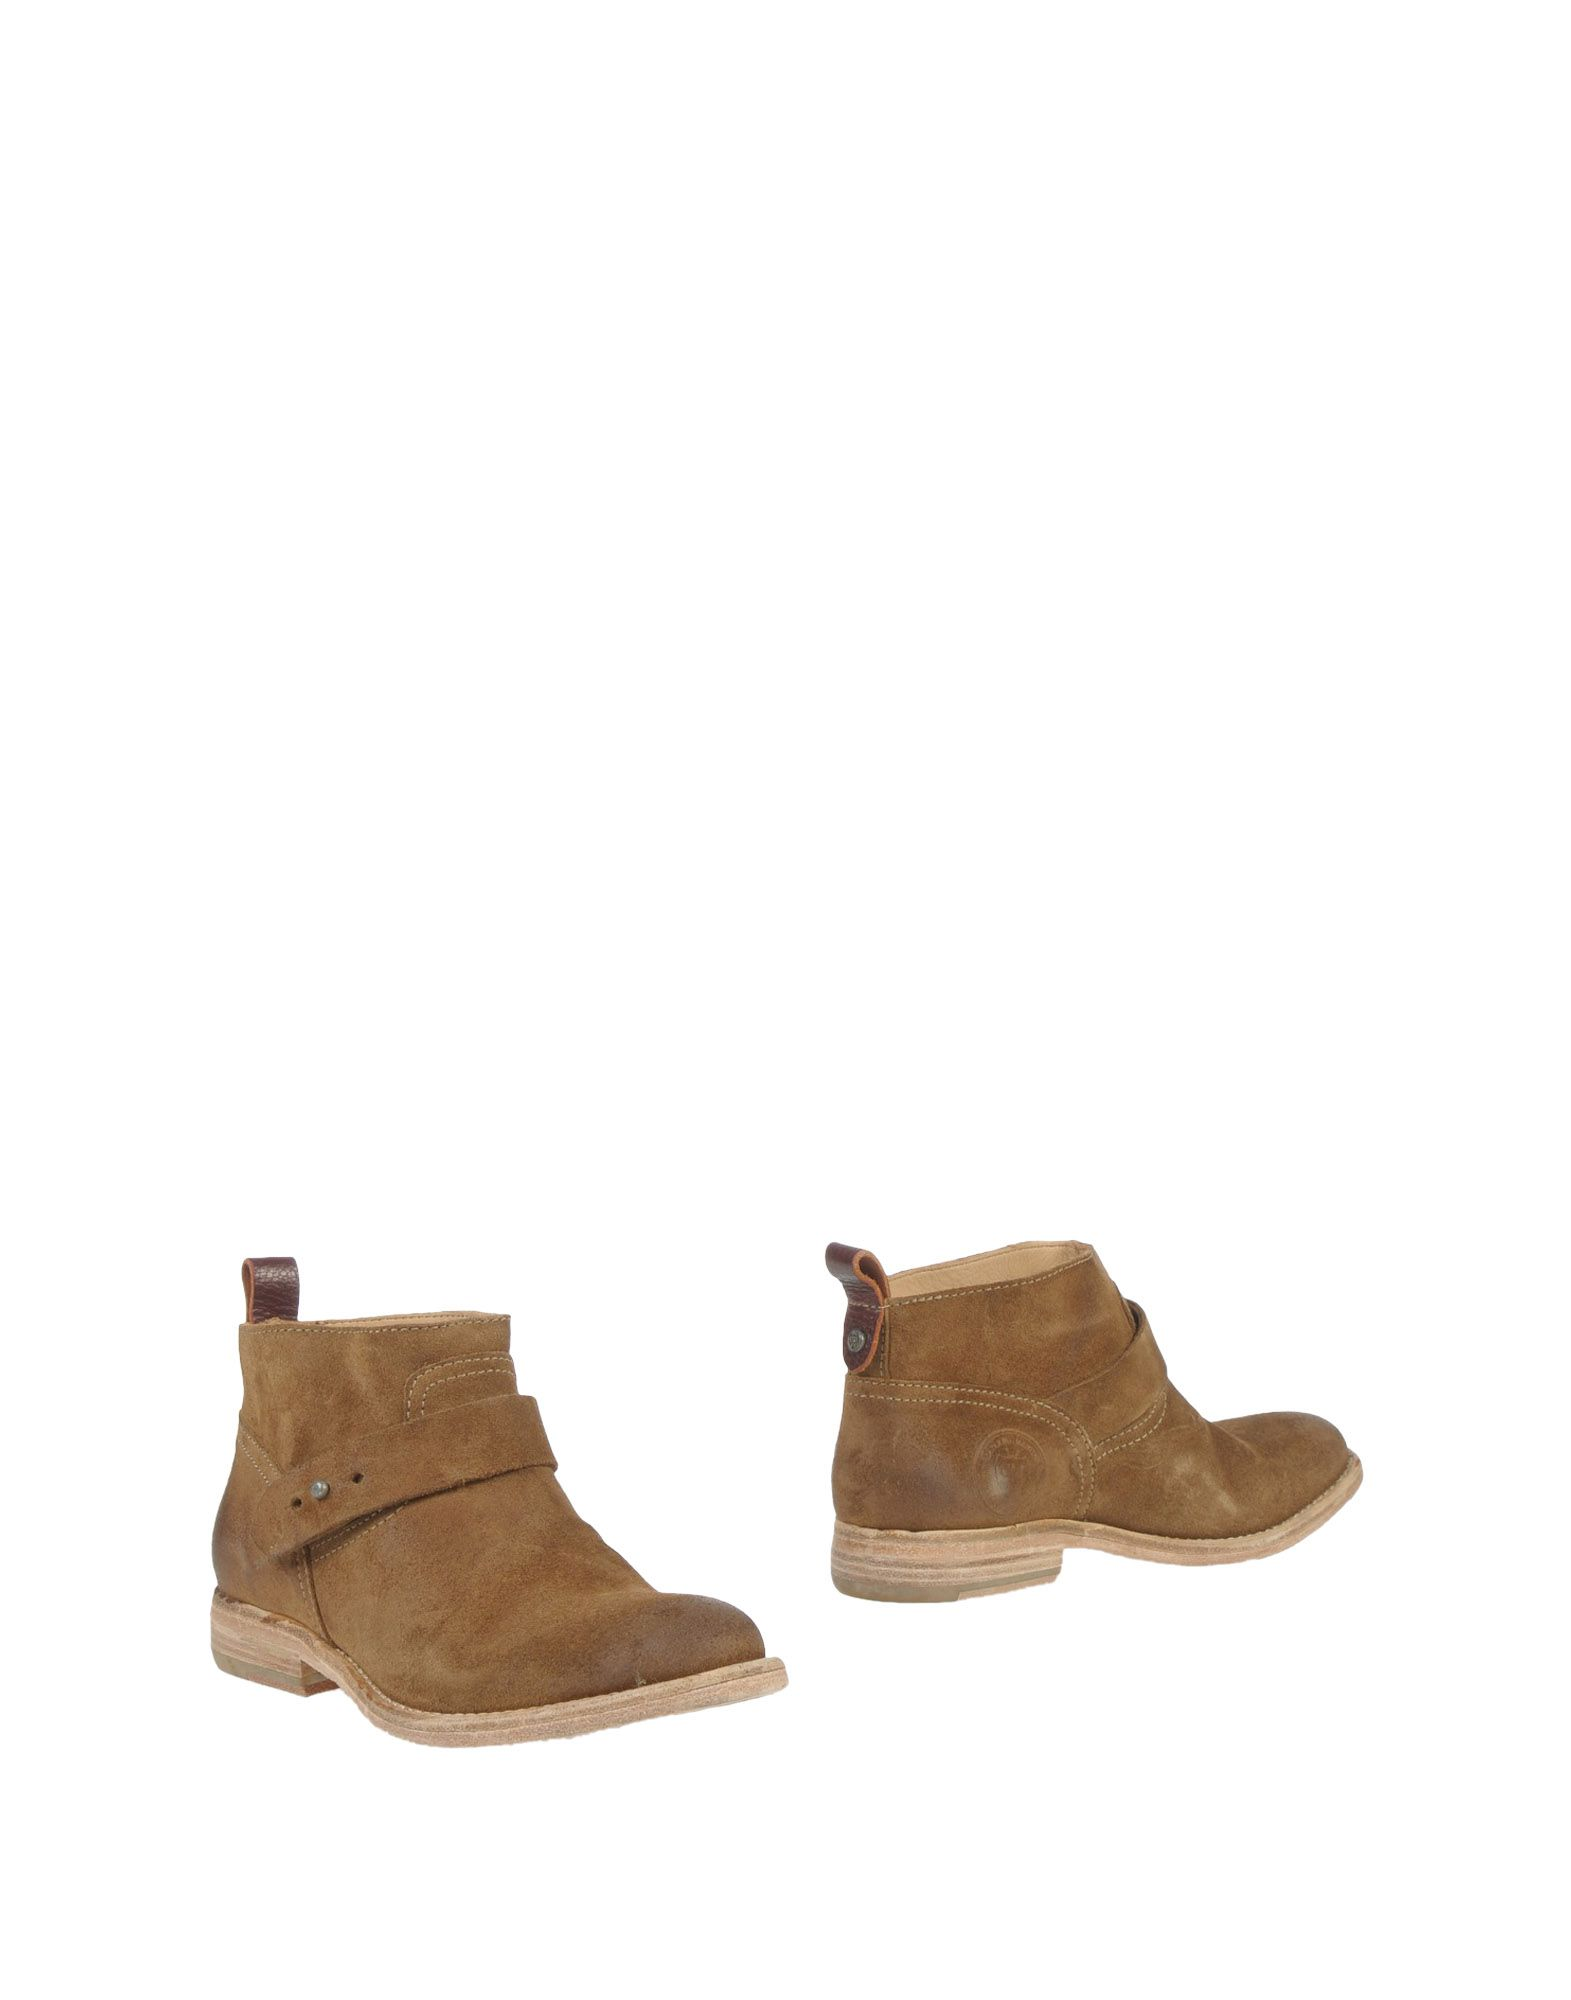 Catarina Martins Ankle Boot - Women Catarina Martins  Ankle Boots online on  Martins Canada - 11396137MC 39eb50